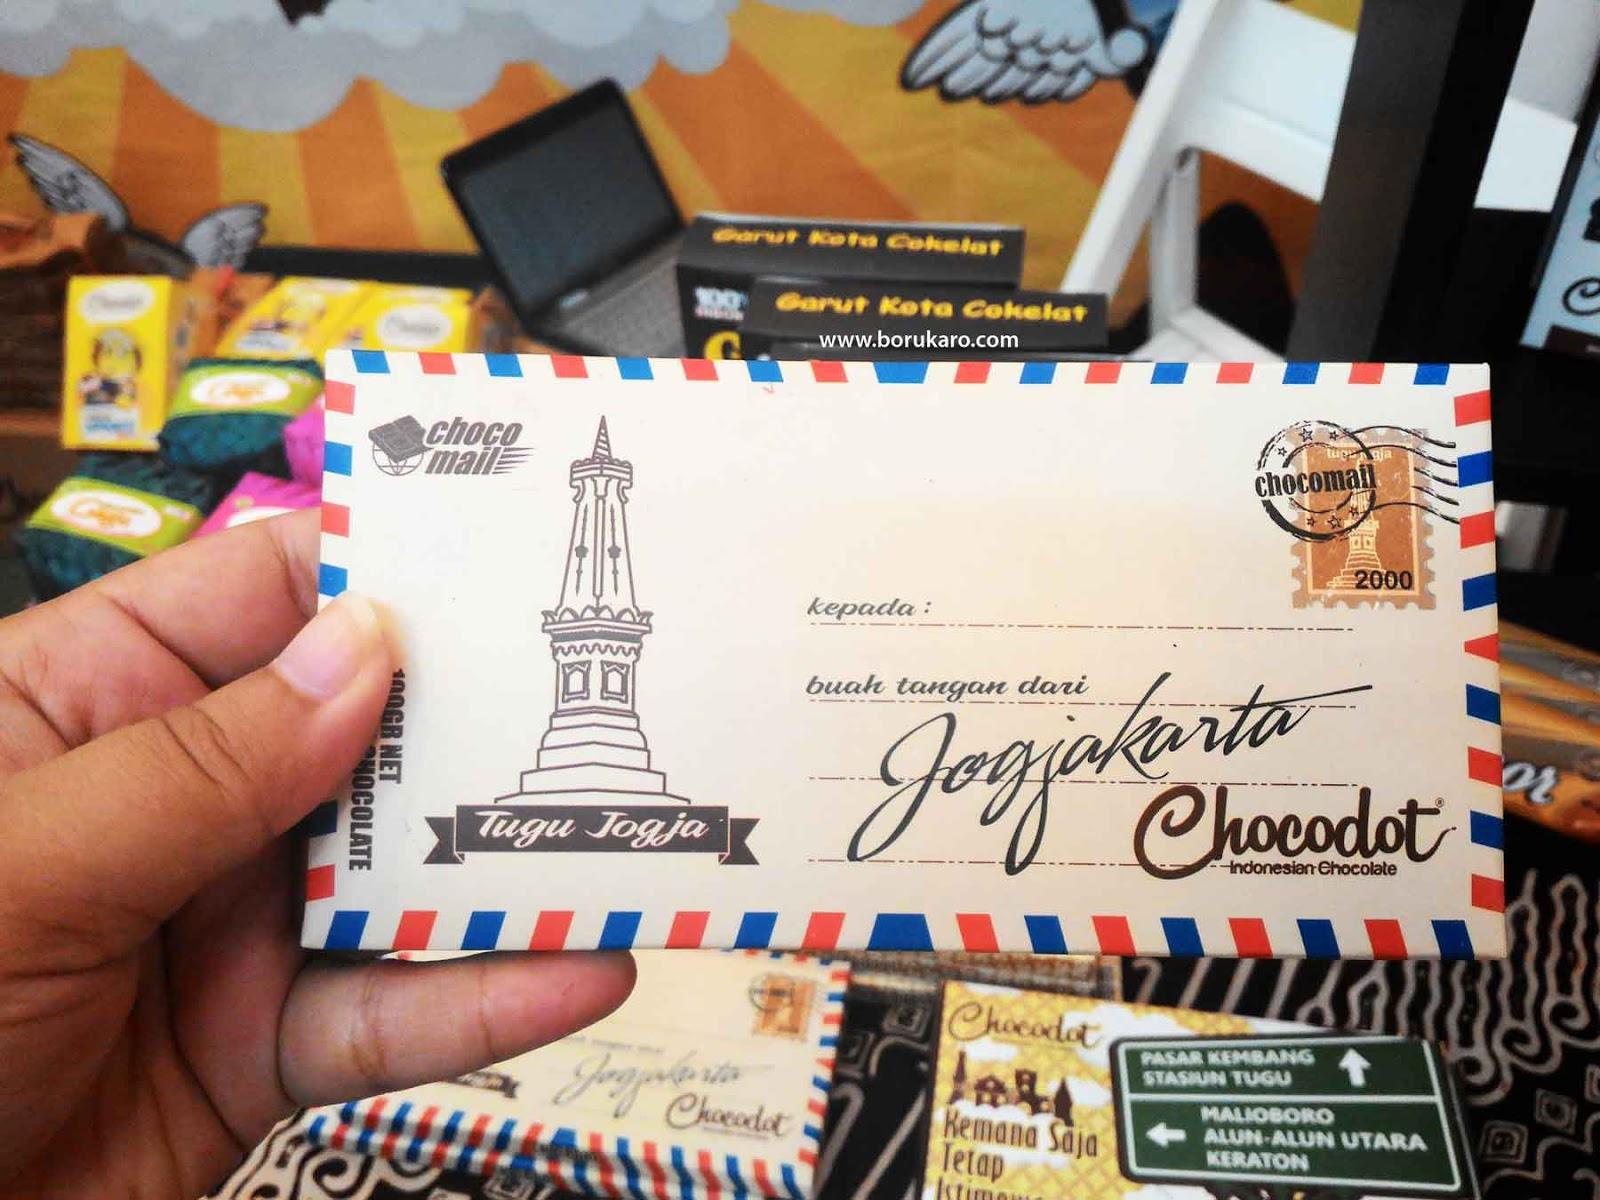 Chocodot Hotel Murah Di Garut HdG Team